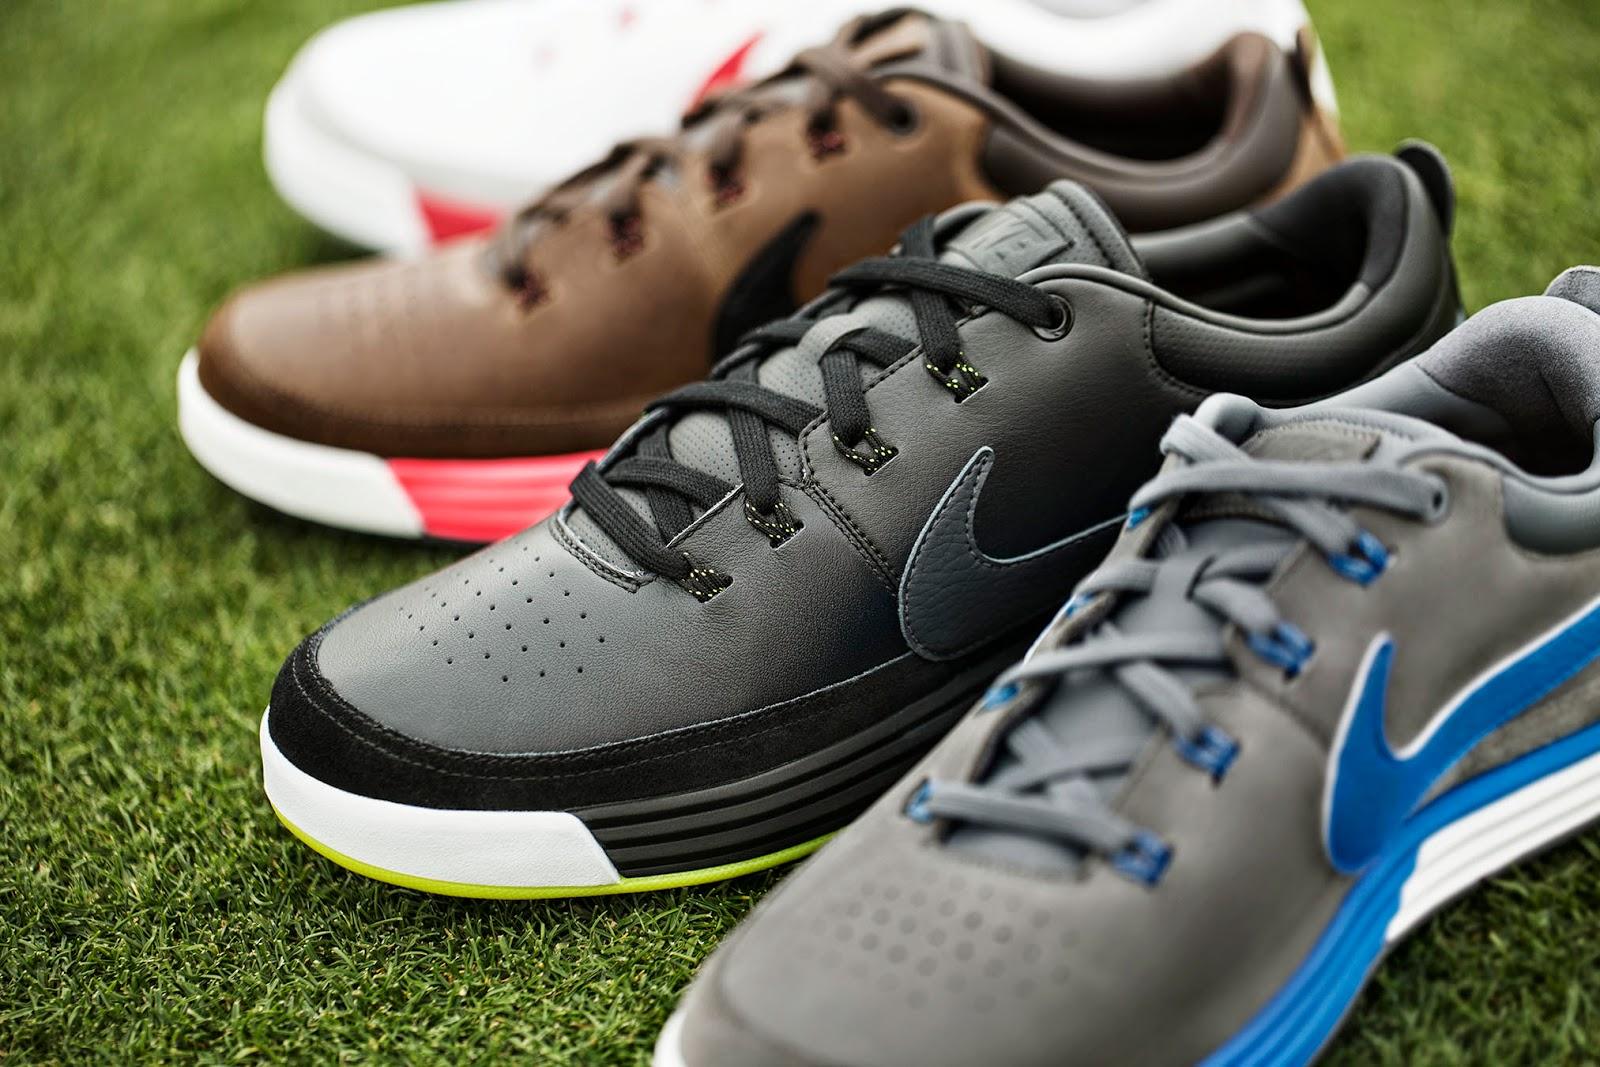 Nike Golf Introduces New Versatility Footwear Styles c99c981d4ad